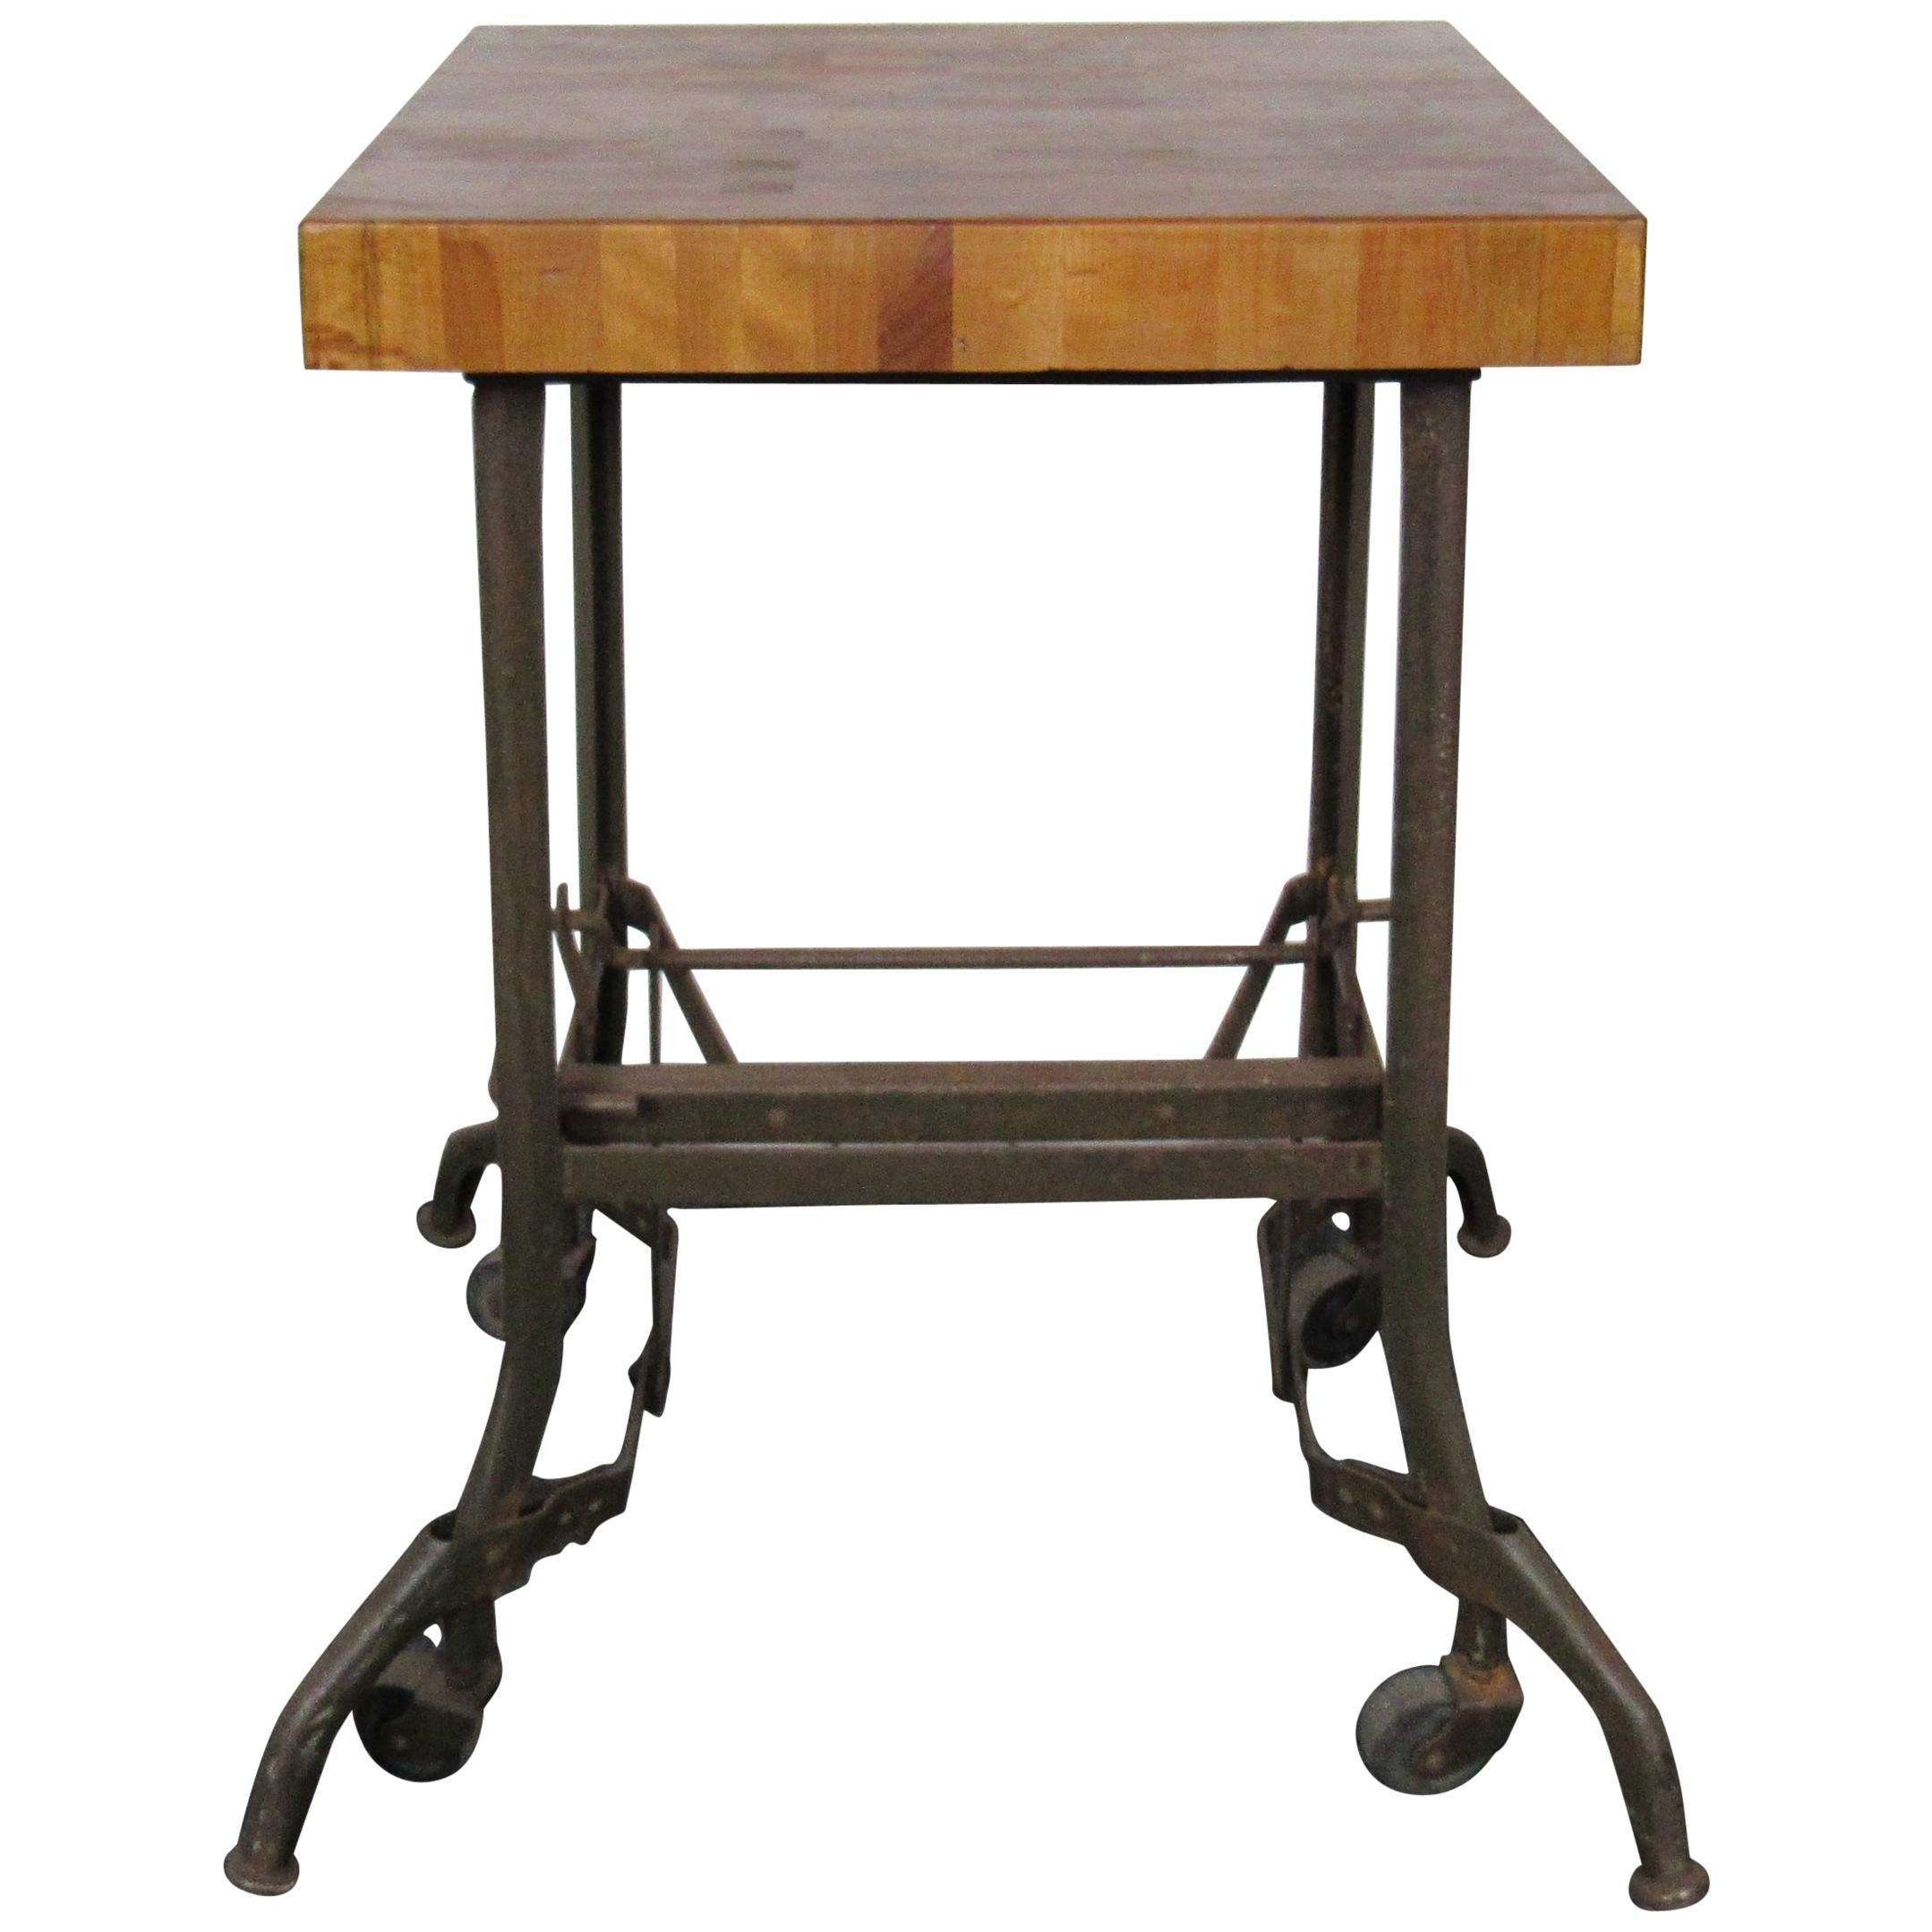 Vintage Industrial Butcher Block Table